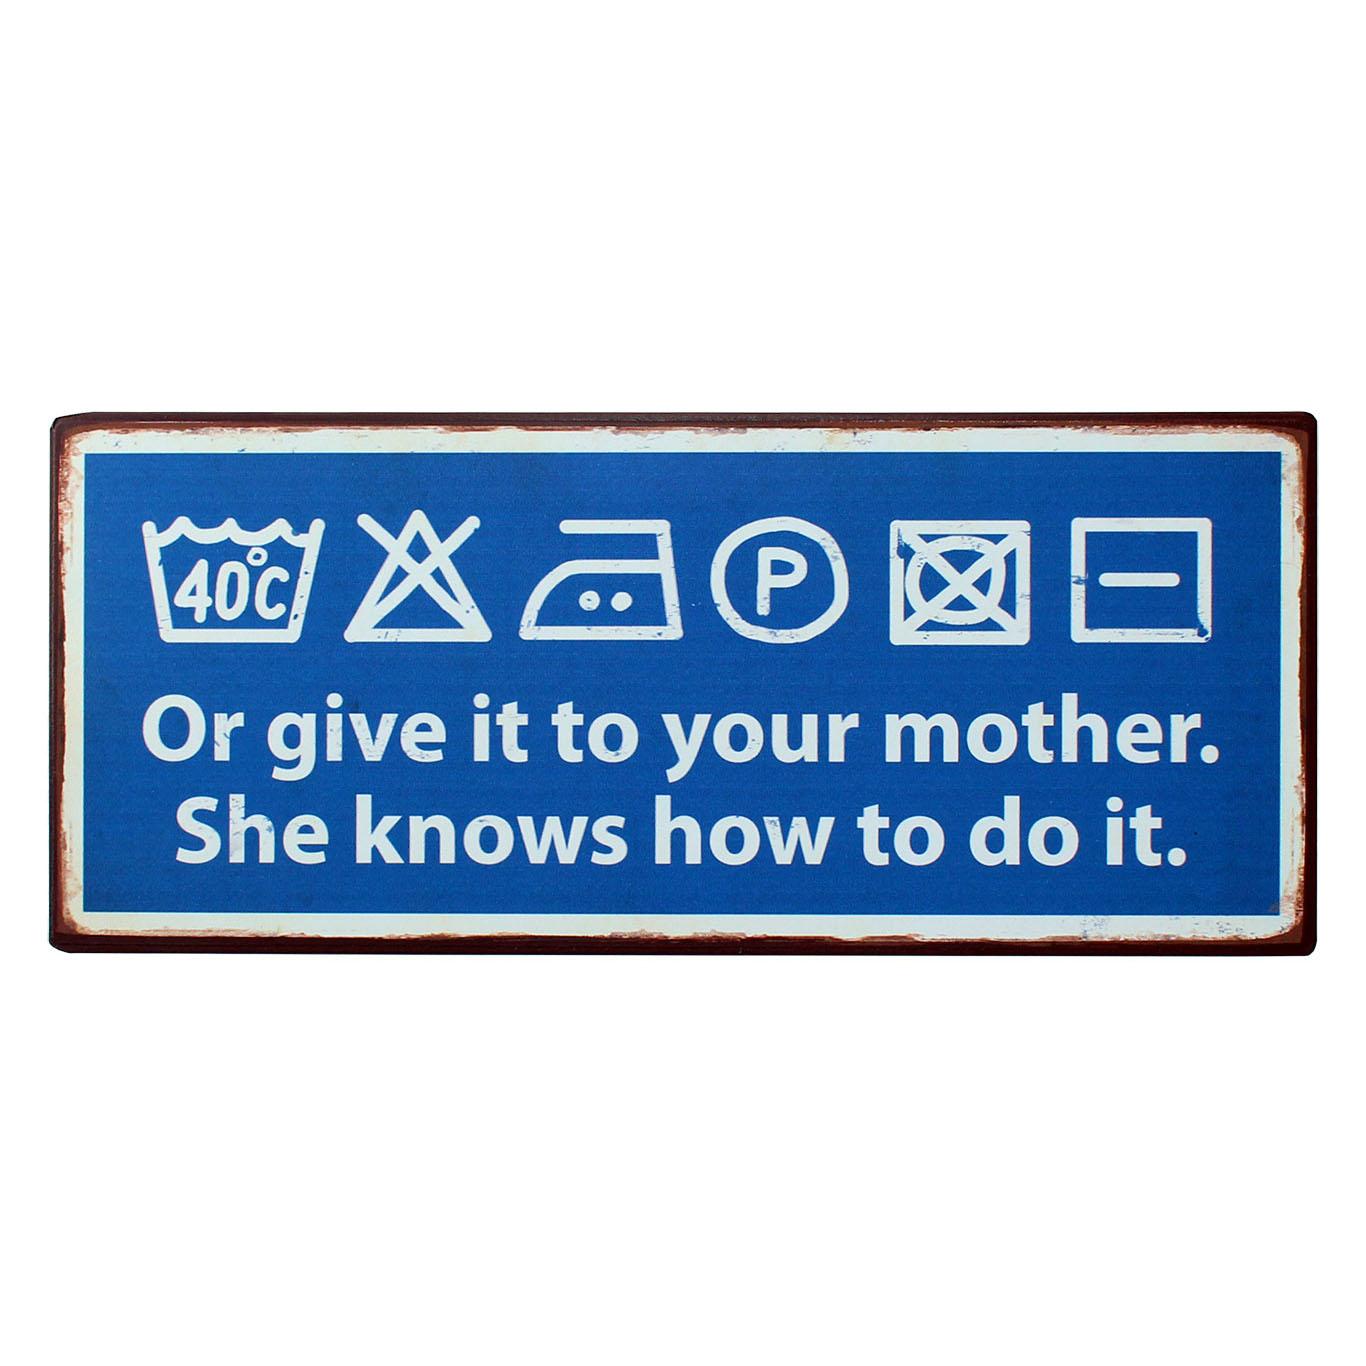 em3335-or-give-it-to-your-mother-she-knows-how-to-do-itt-spreukenbord-tekstbord-uitspraken-gezegde-spreuken-rustiek-tekst-bord-cadeau-kado-online-metaal v